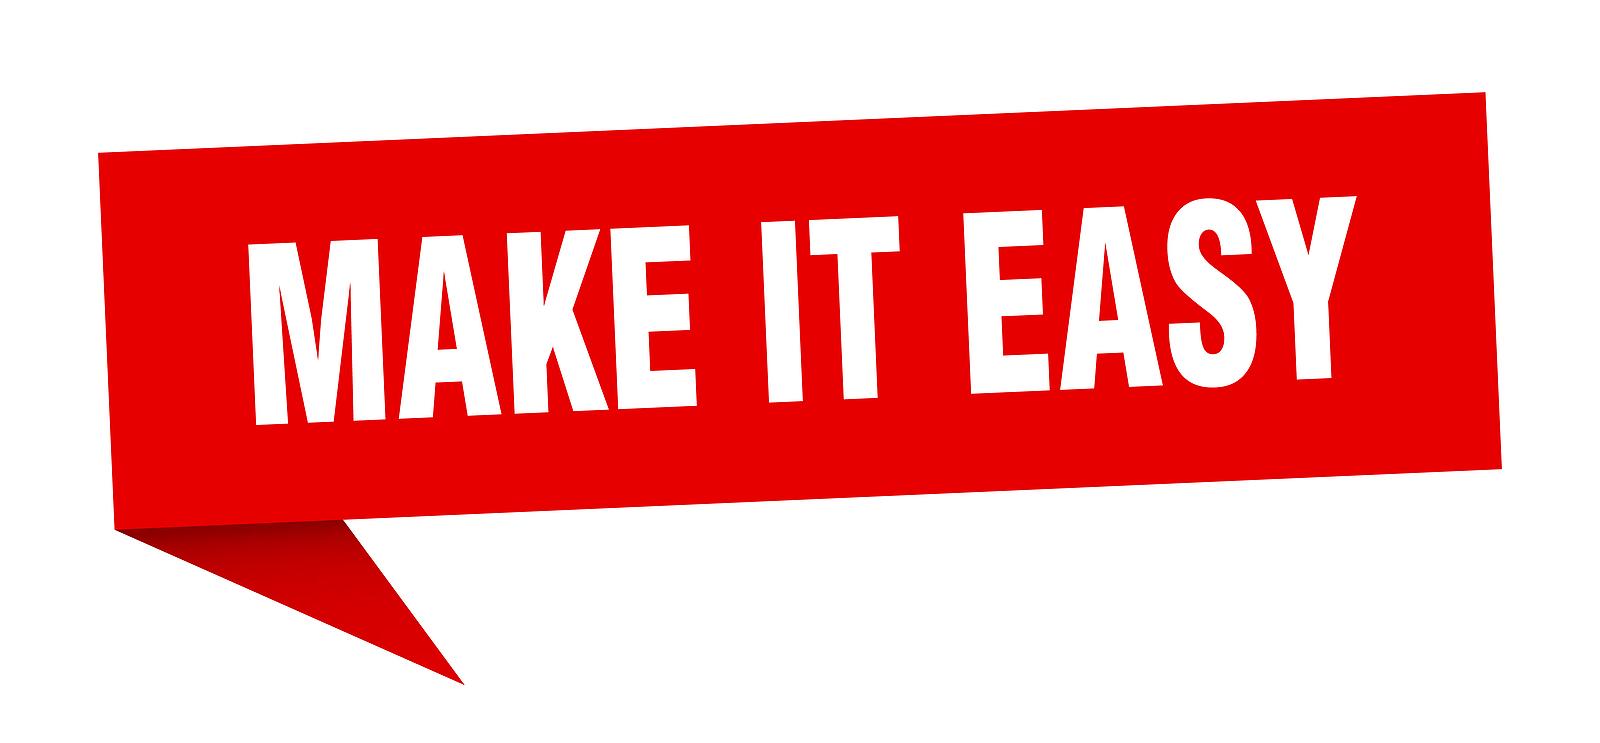 make it easy banner. make it easy speech bubble. make it easy sign